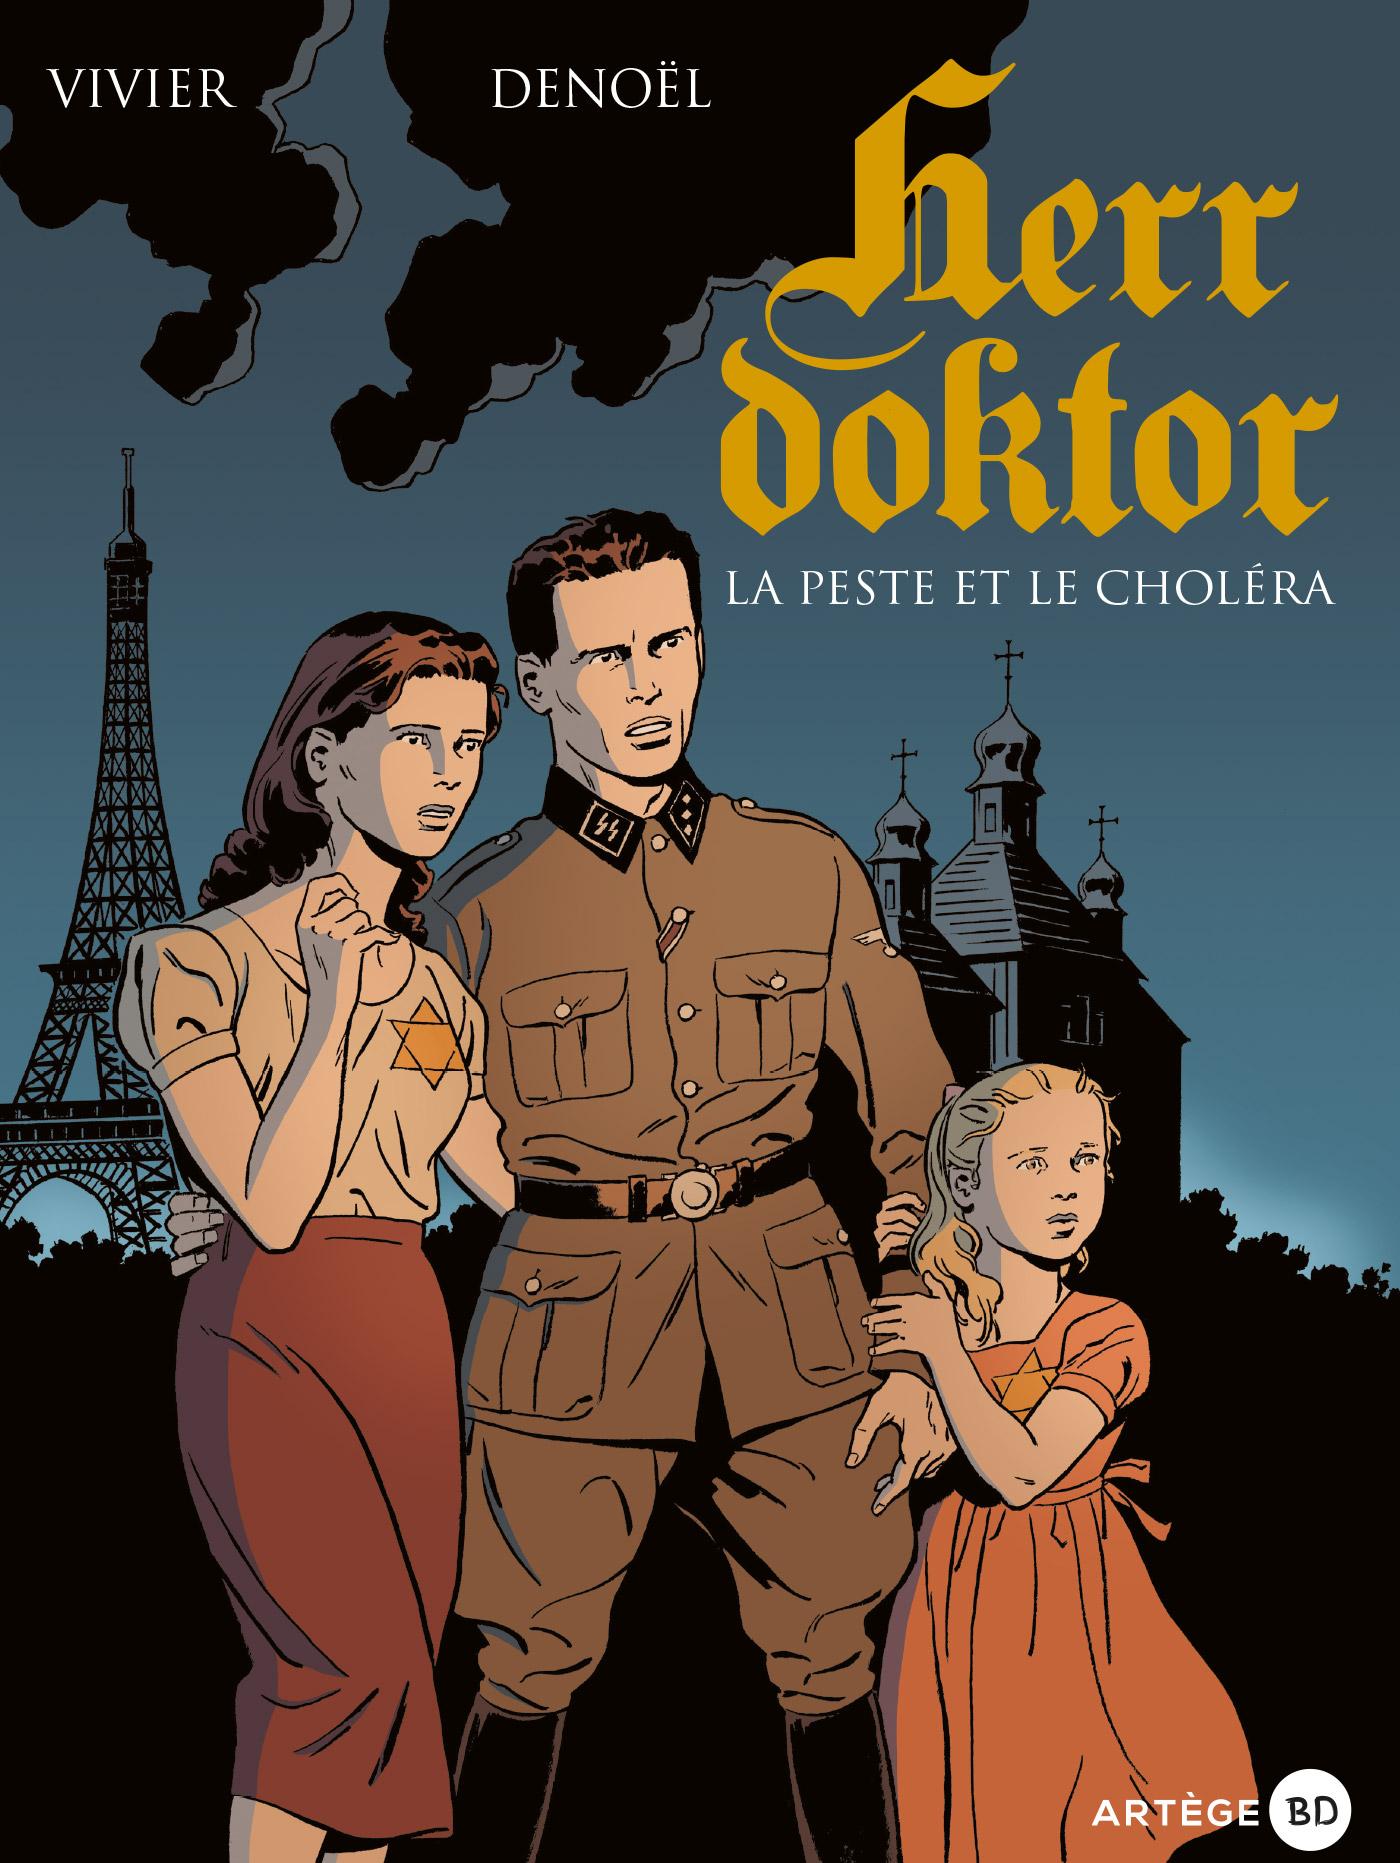 Herr Doktor (Tome 1) - La peste et le choléra